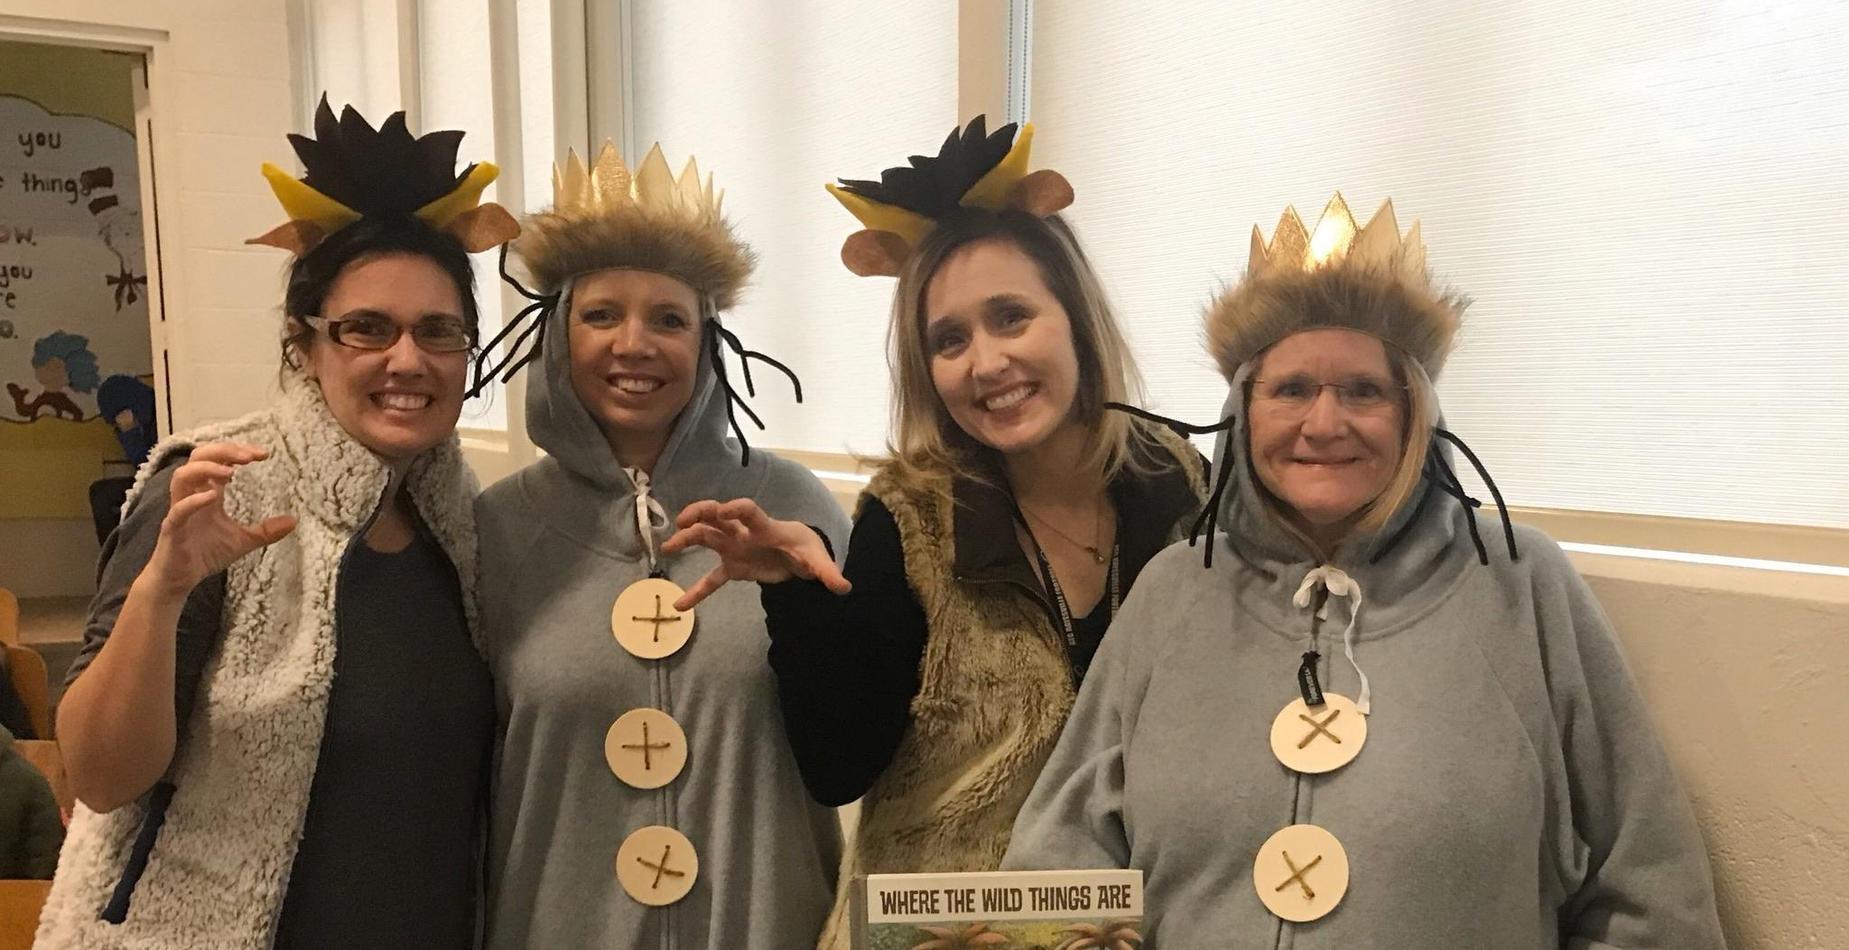 teachers in costumes